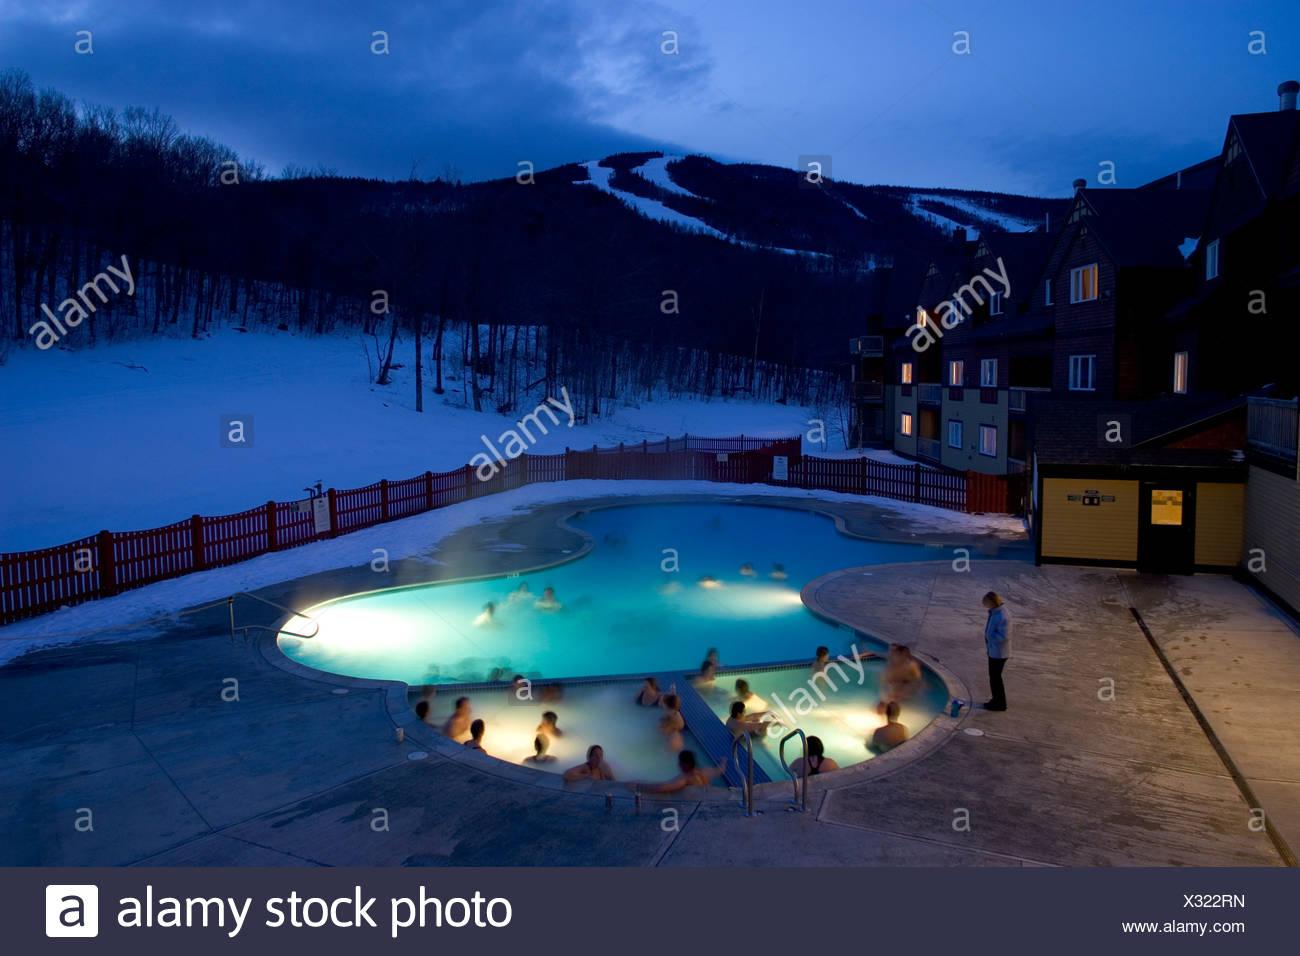 Hot Tub Snow Stock Photos & Hot Tub Snow Stock Images - Alamy